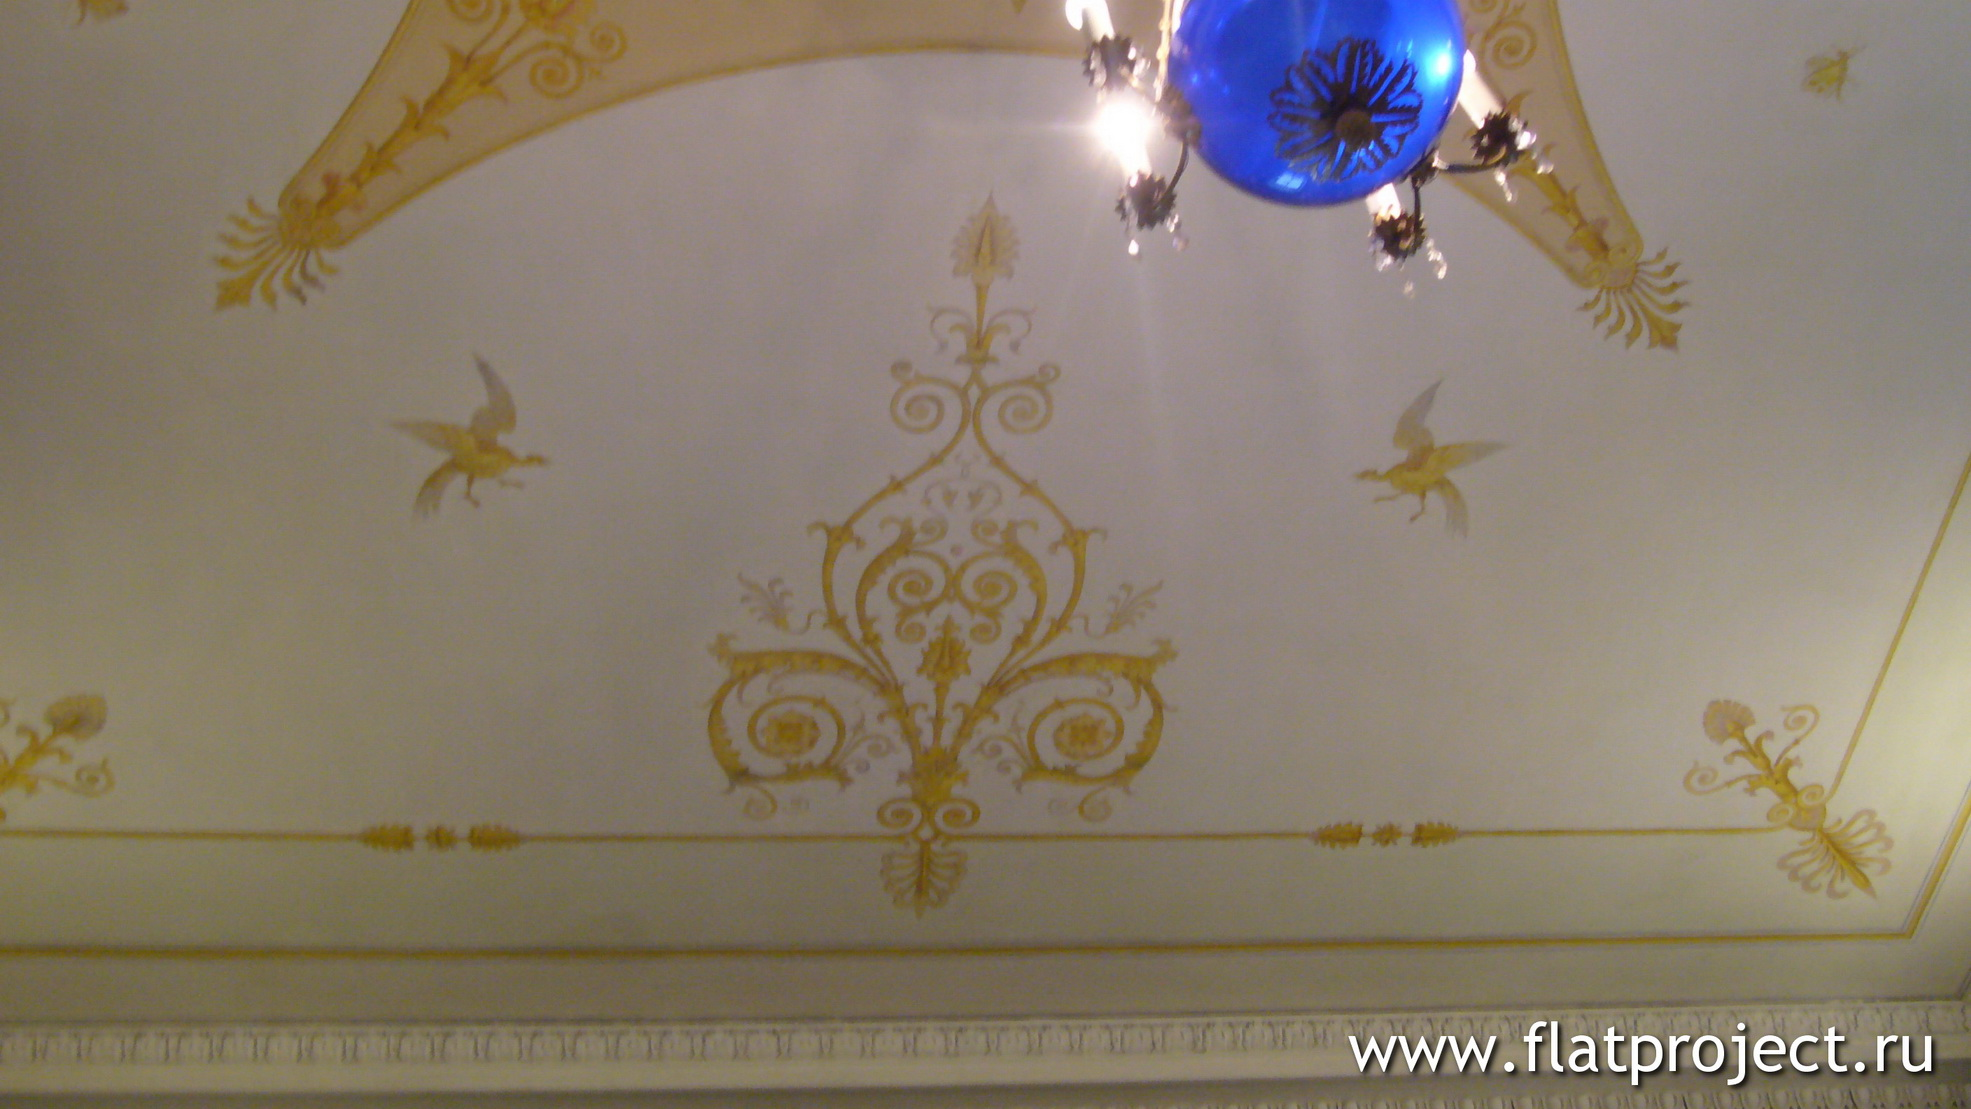 The State Hermitage museum interiors – photo 120